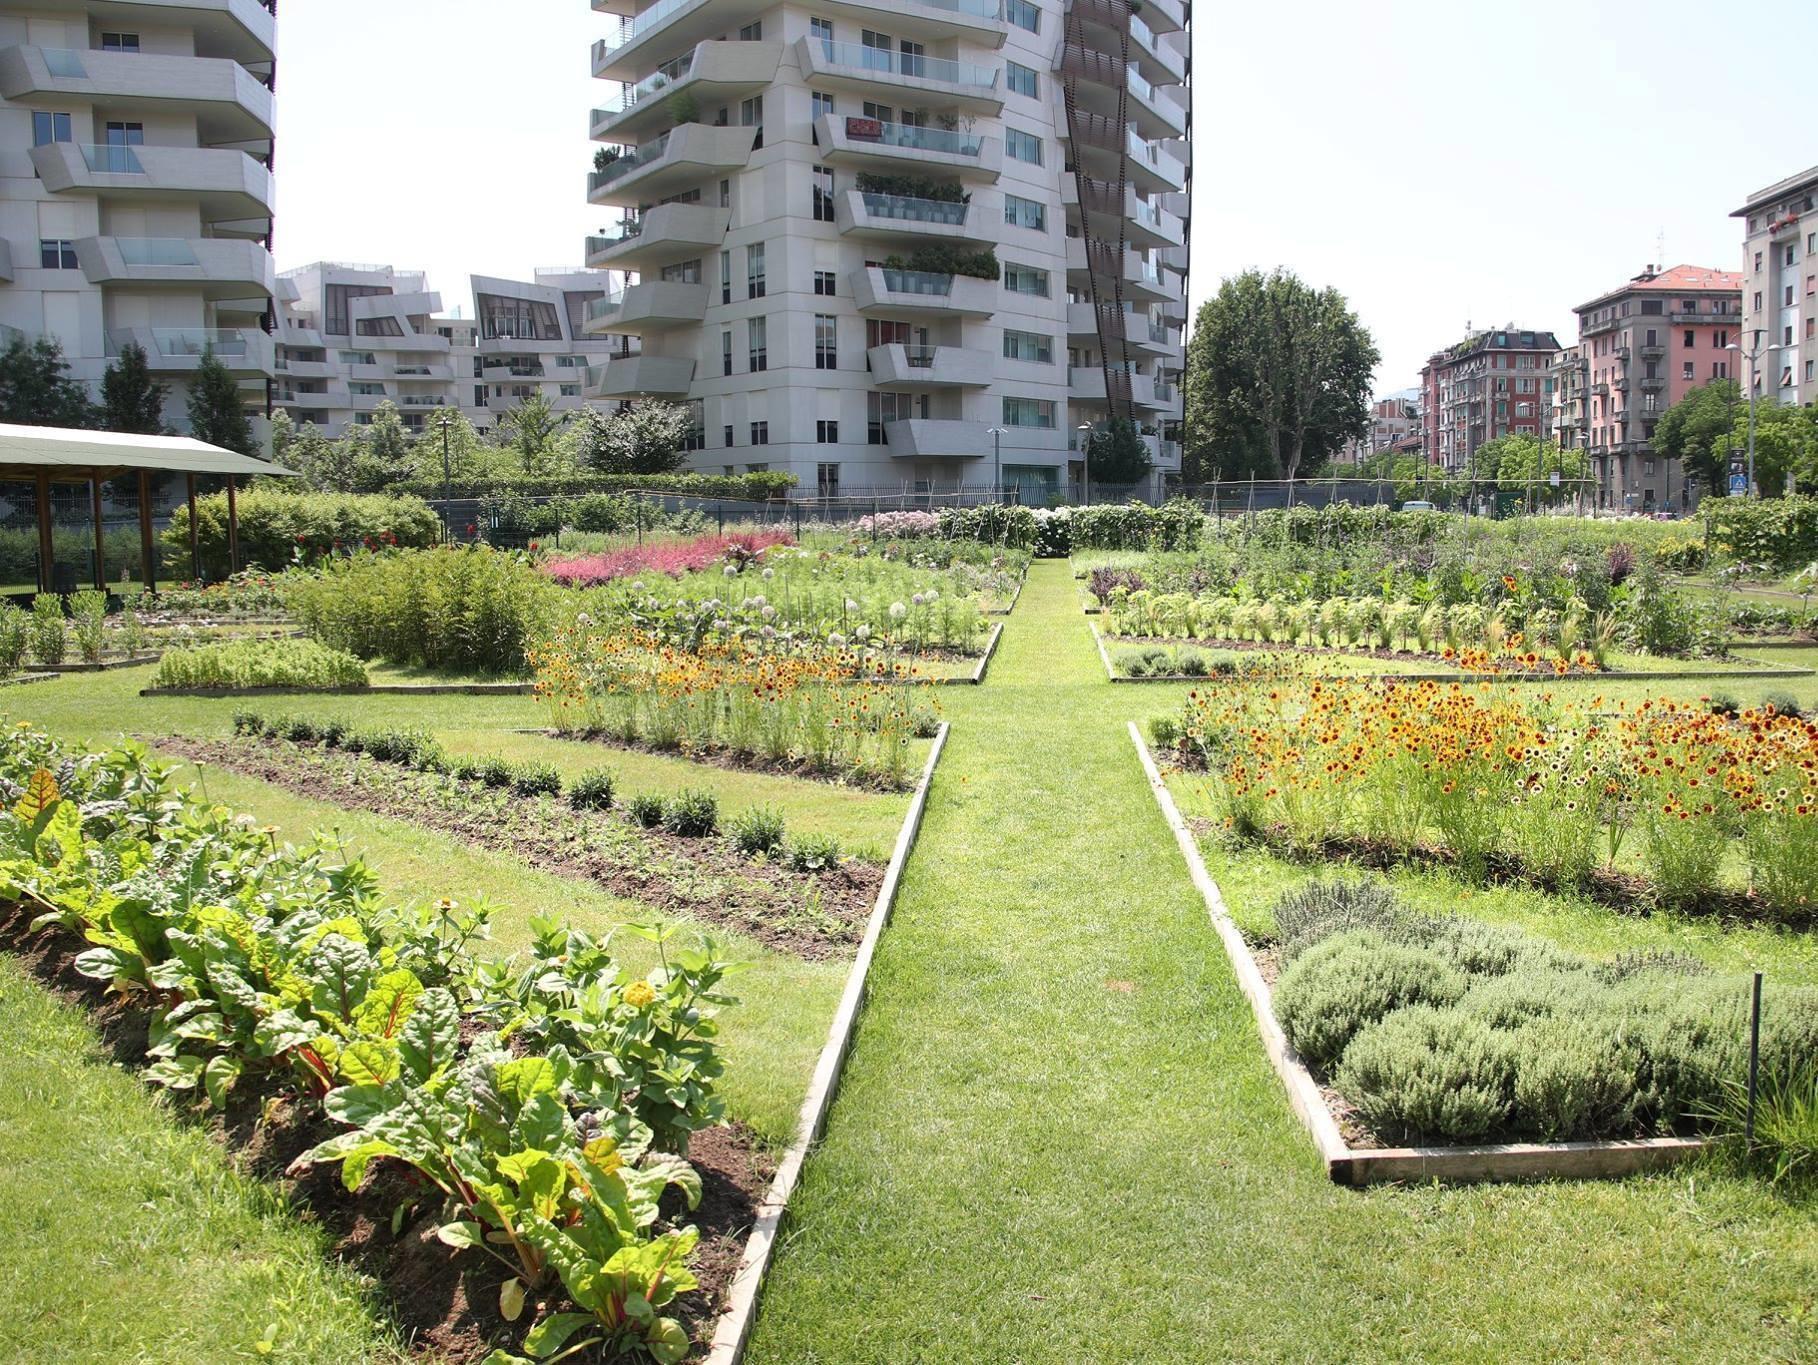 Garden in CityLife park.